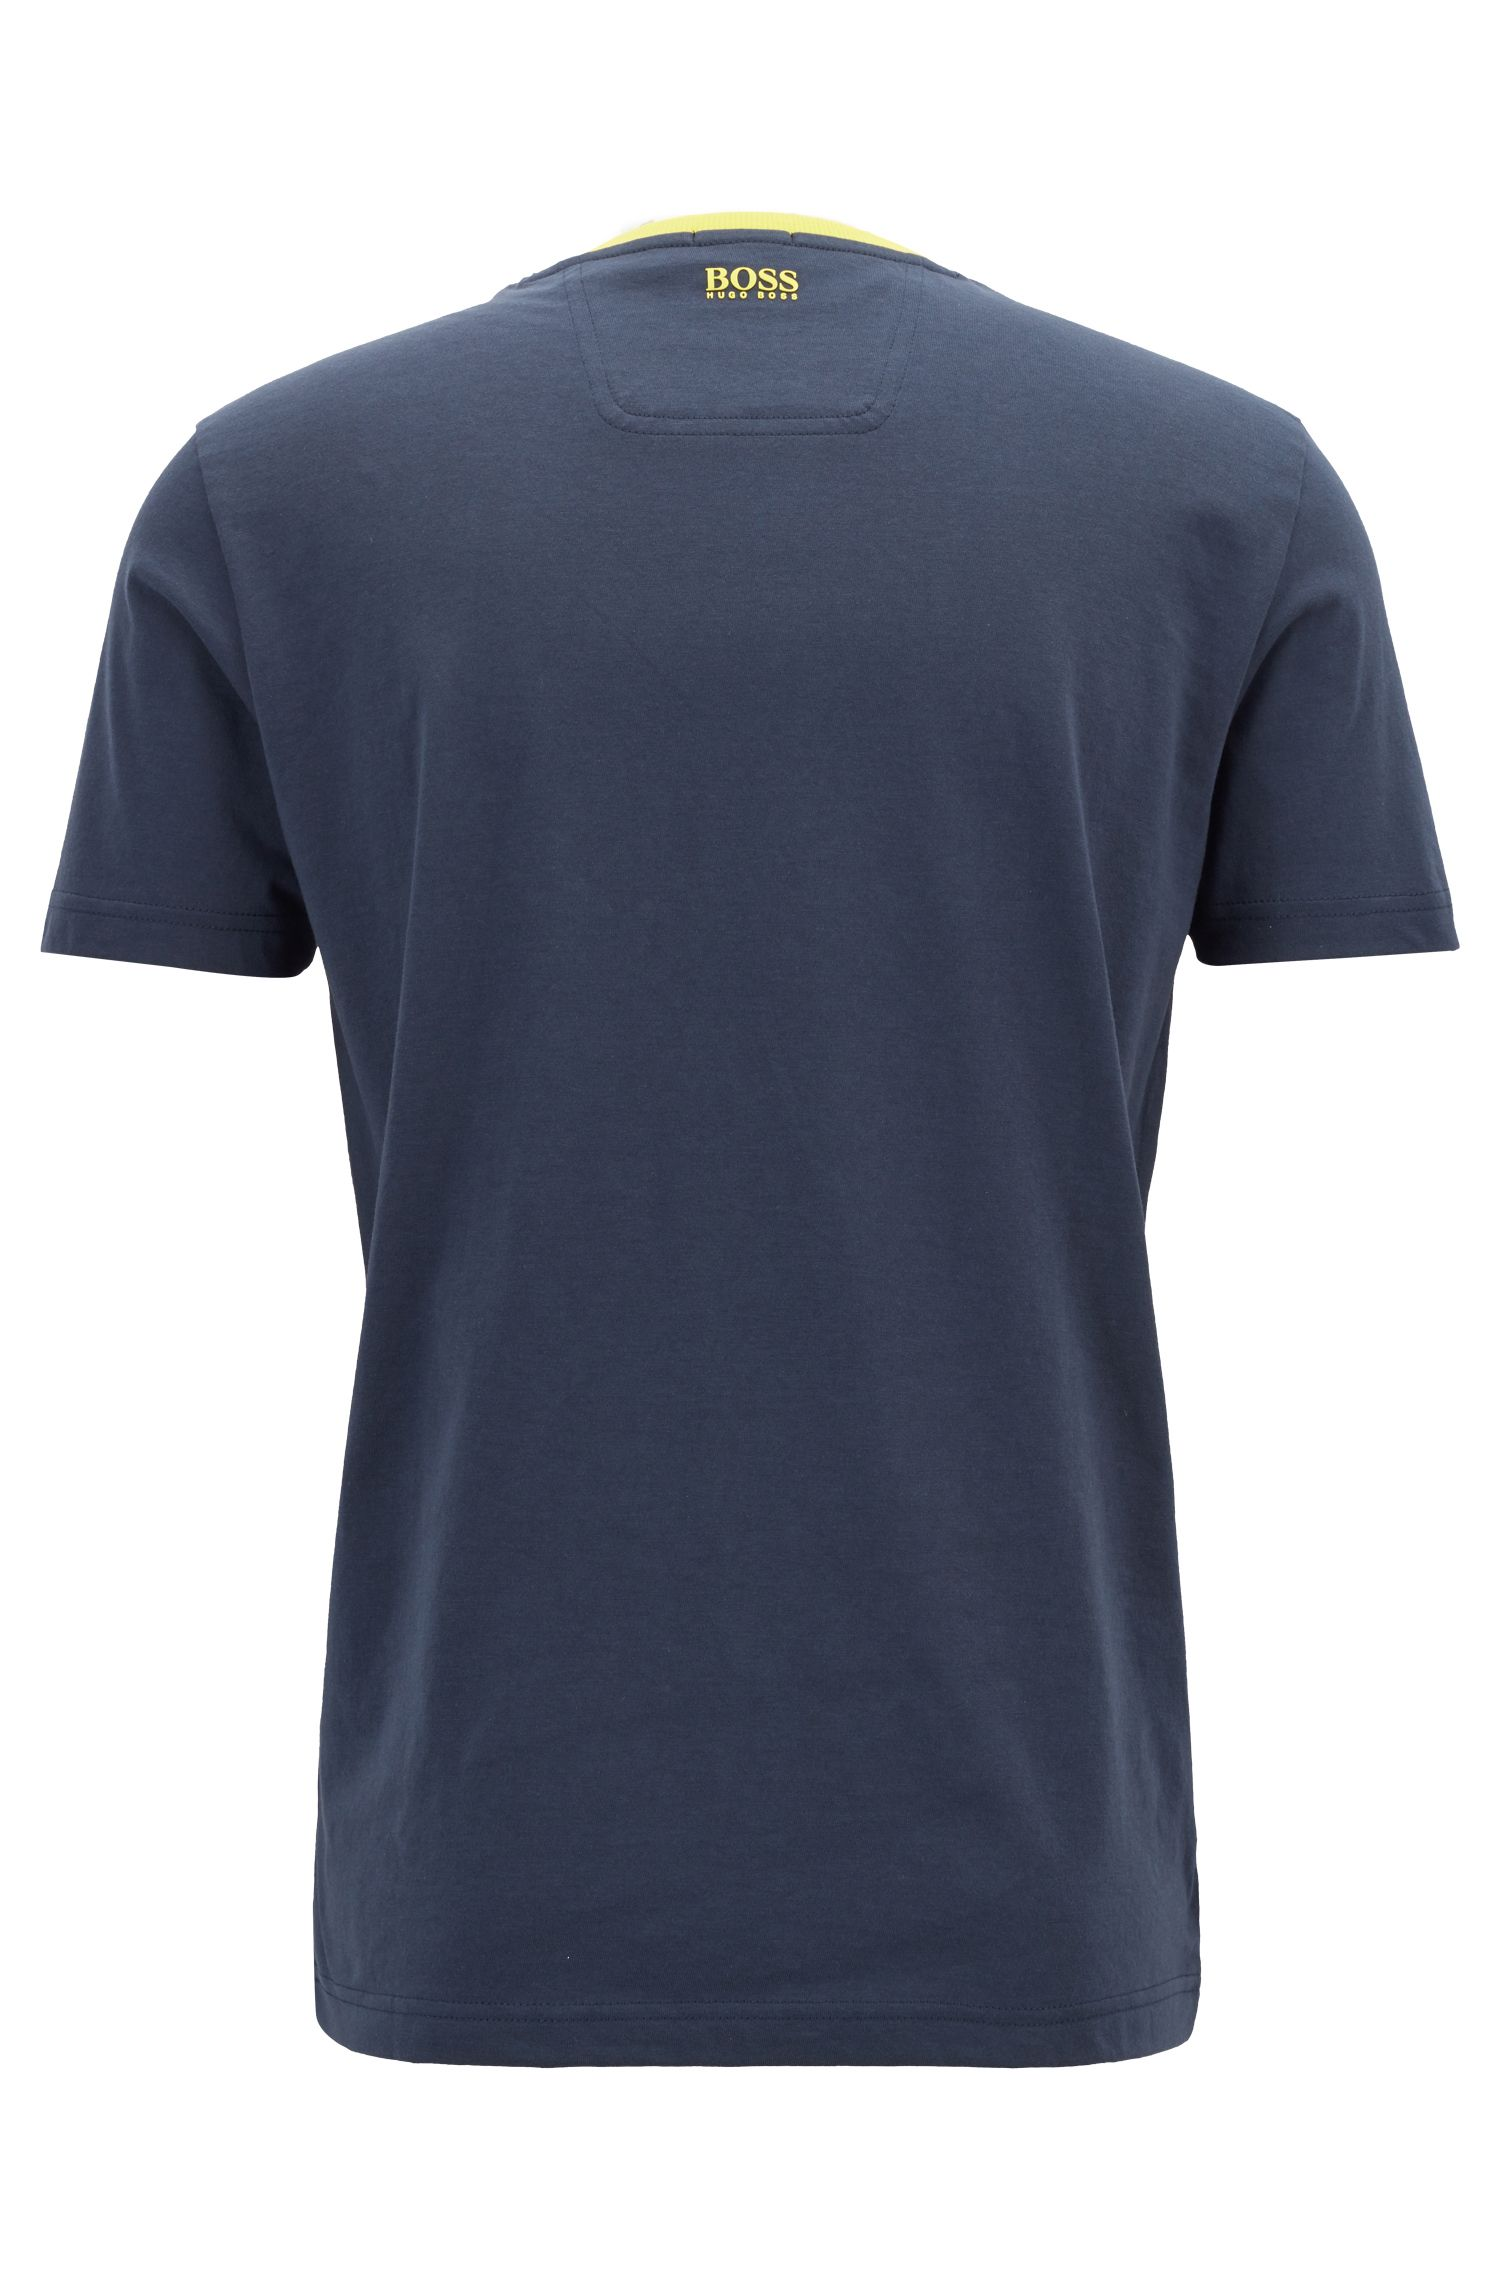 Graphic print T-shirt in eco-friendly jersey, Dark Blue